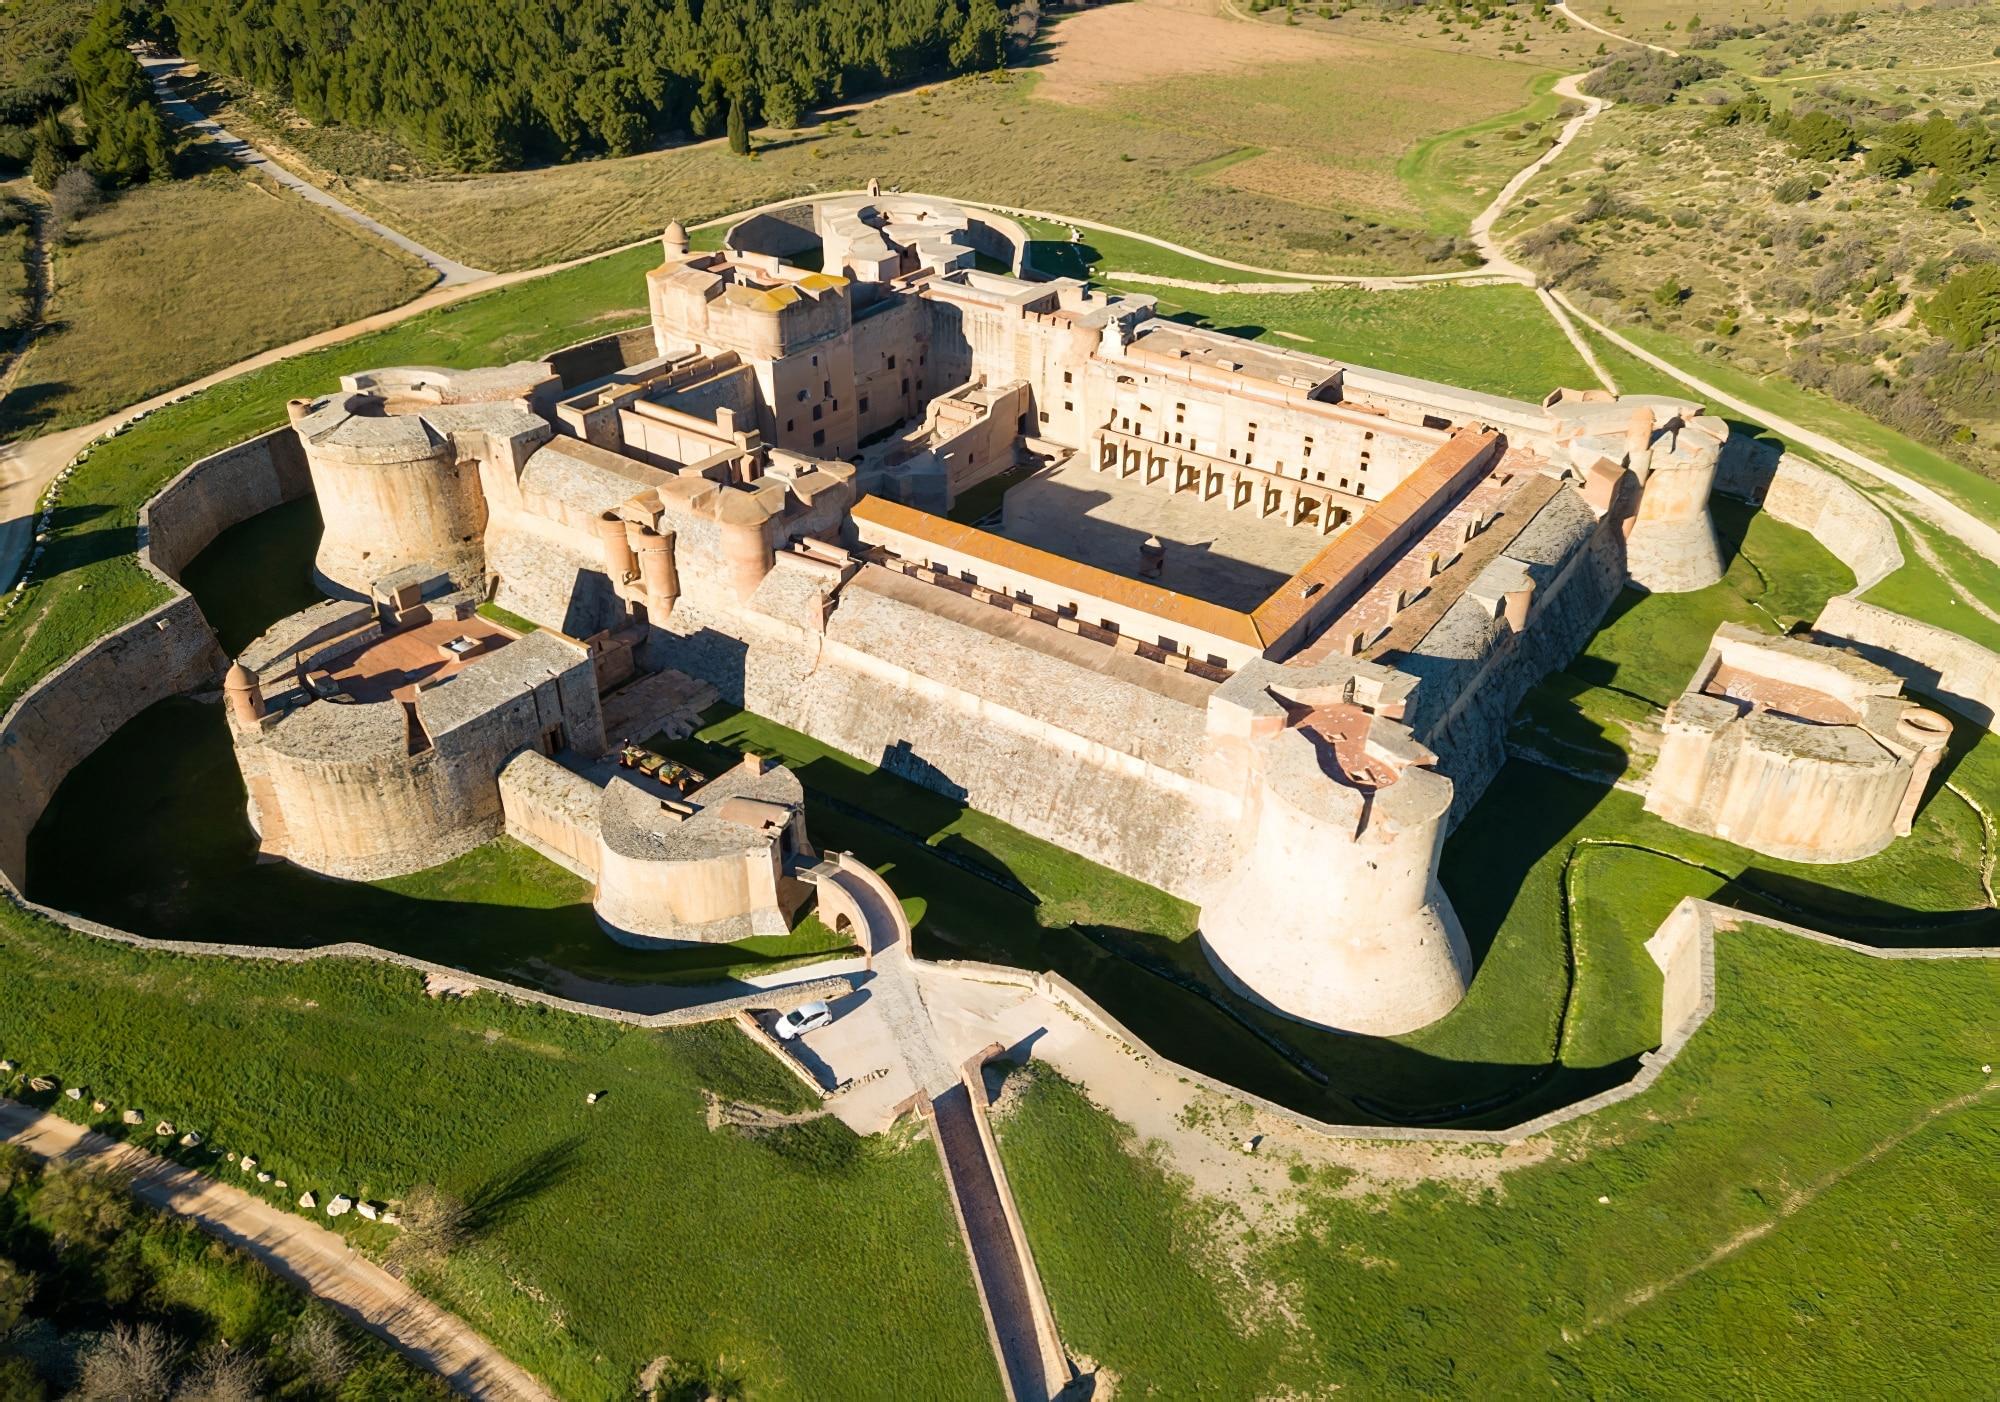 Visiter la Forteresse de Salses près de Perpignan